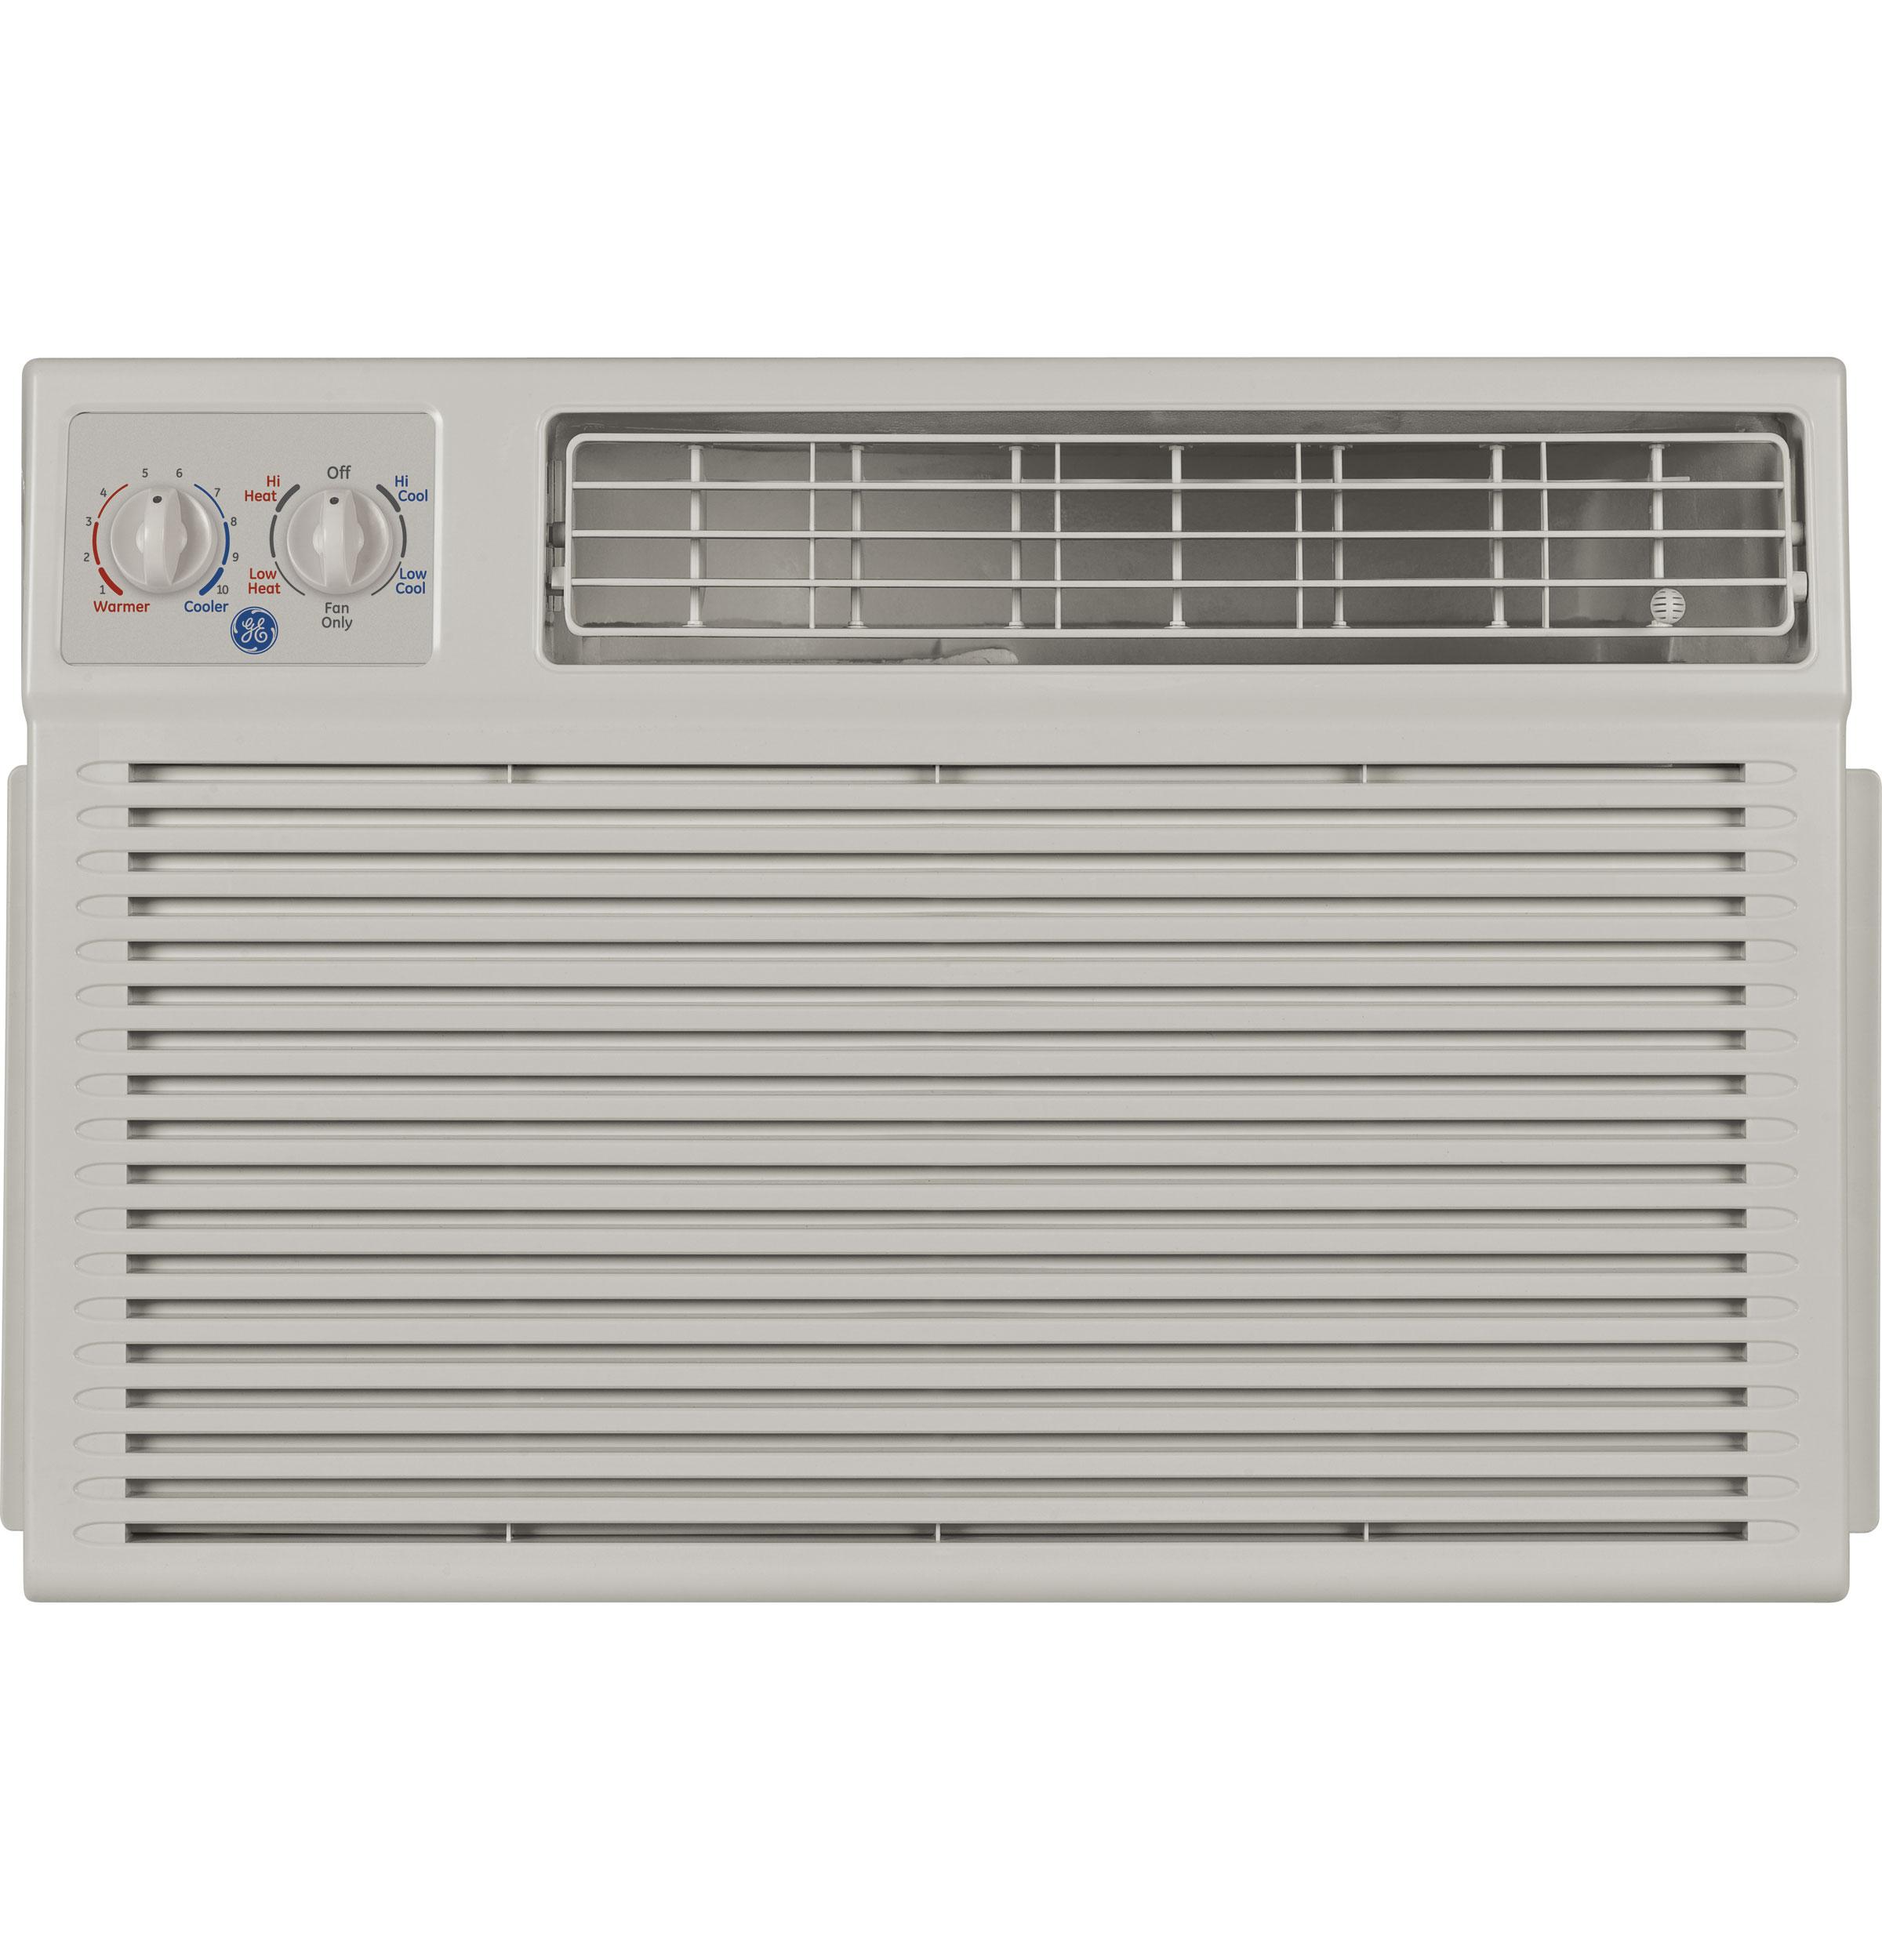 GE Appliances Warehouse: 115 Volt Heat/Cool Room Air Conditioner 8000 BTU - $269 Plus Free Shipping